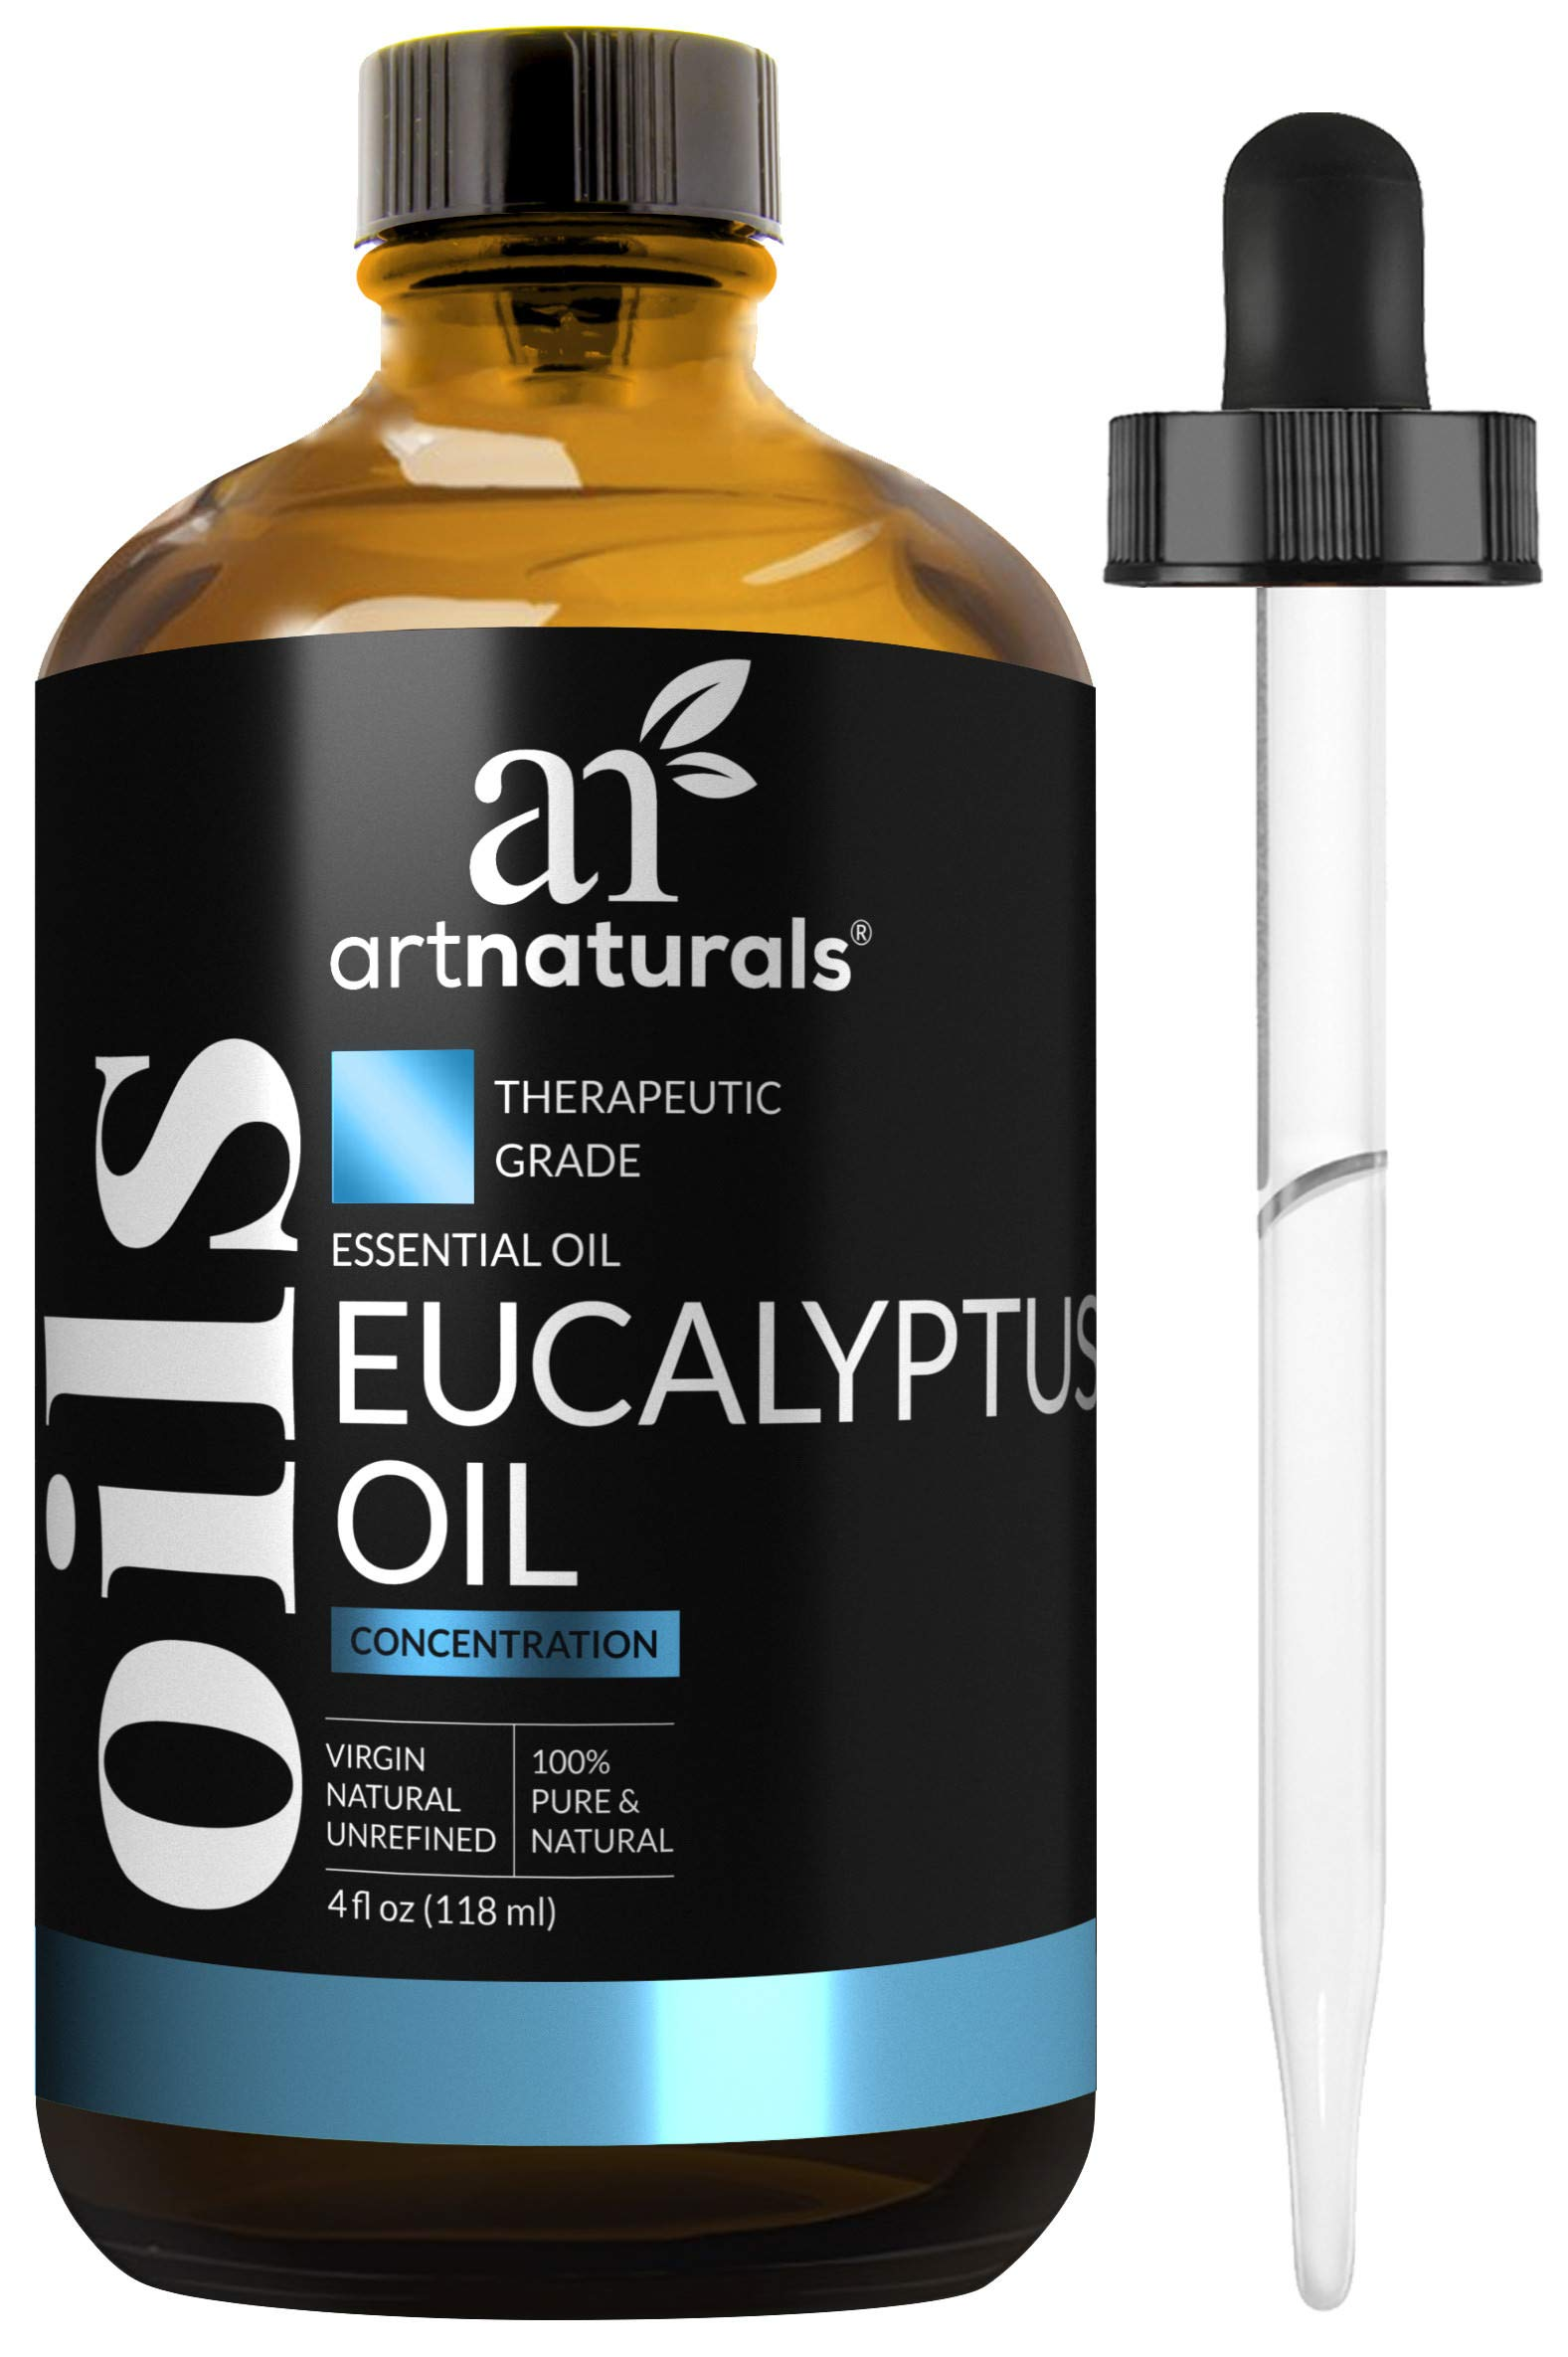 ArtNaturals 100% Pure Eucalyptus Essential Oil - (4.0 Fl Oz / 120ml) - Therapeutic Grade Natural Oils